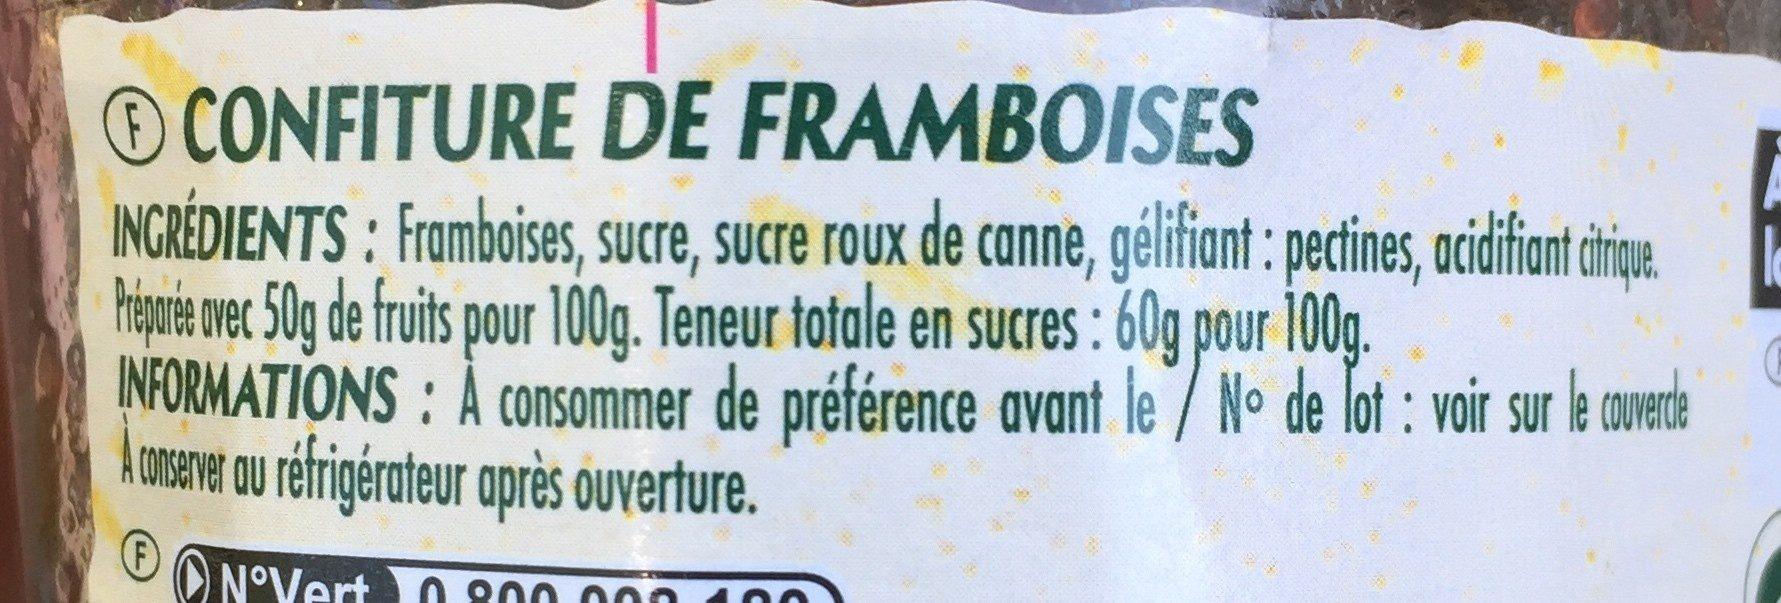 Confiture de framboises Elodie - Ingrediënten - fr